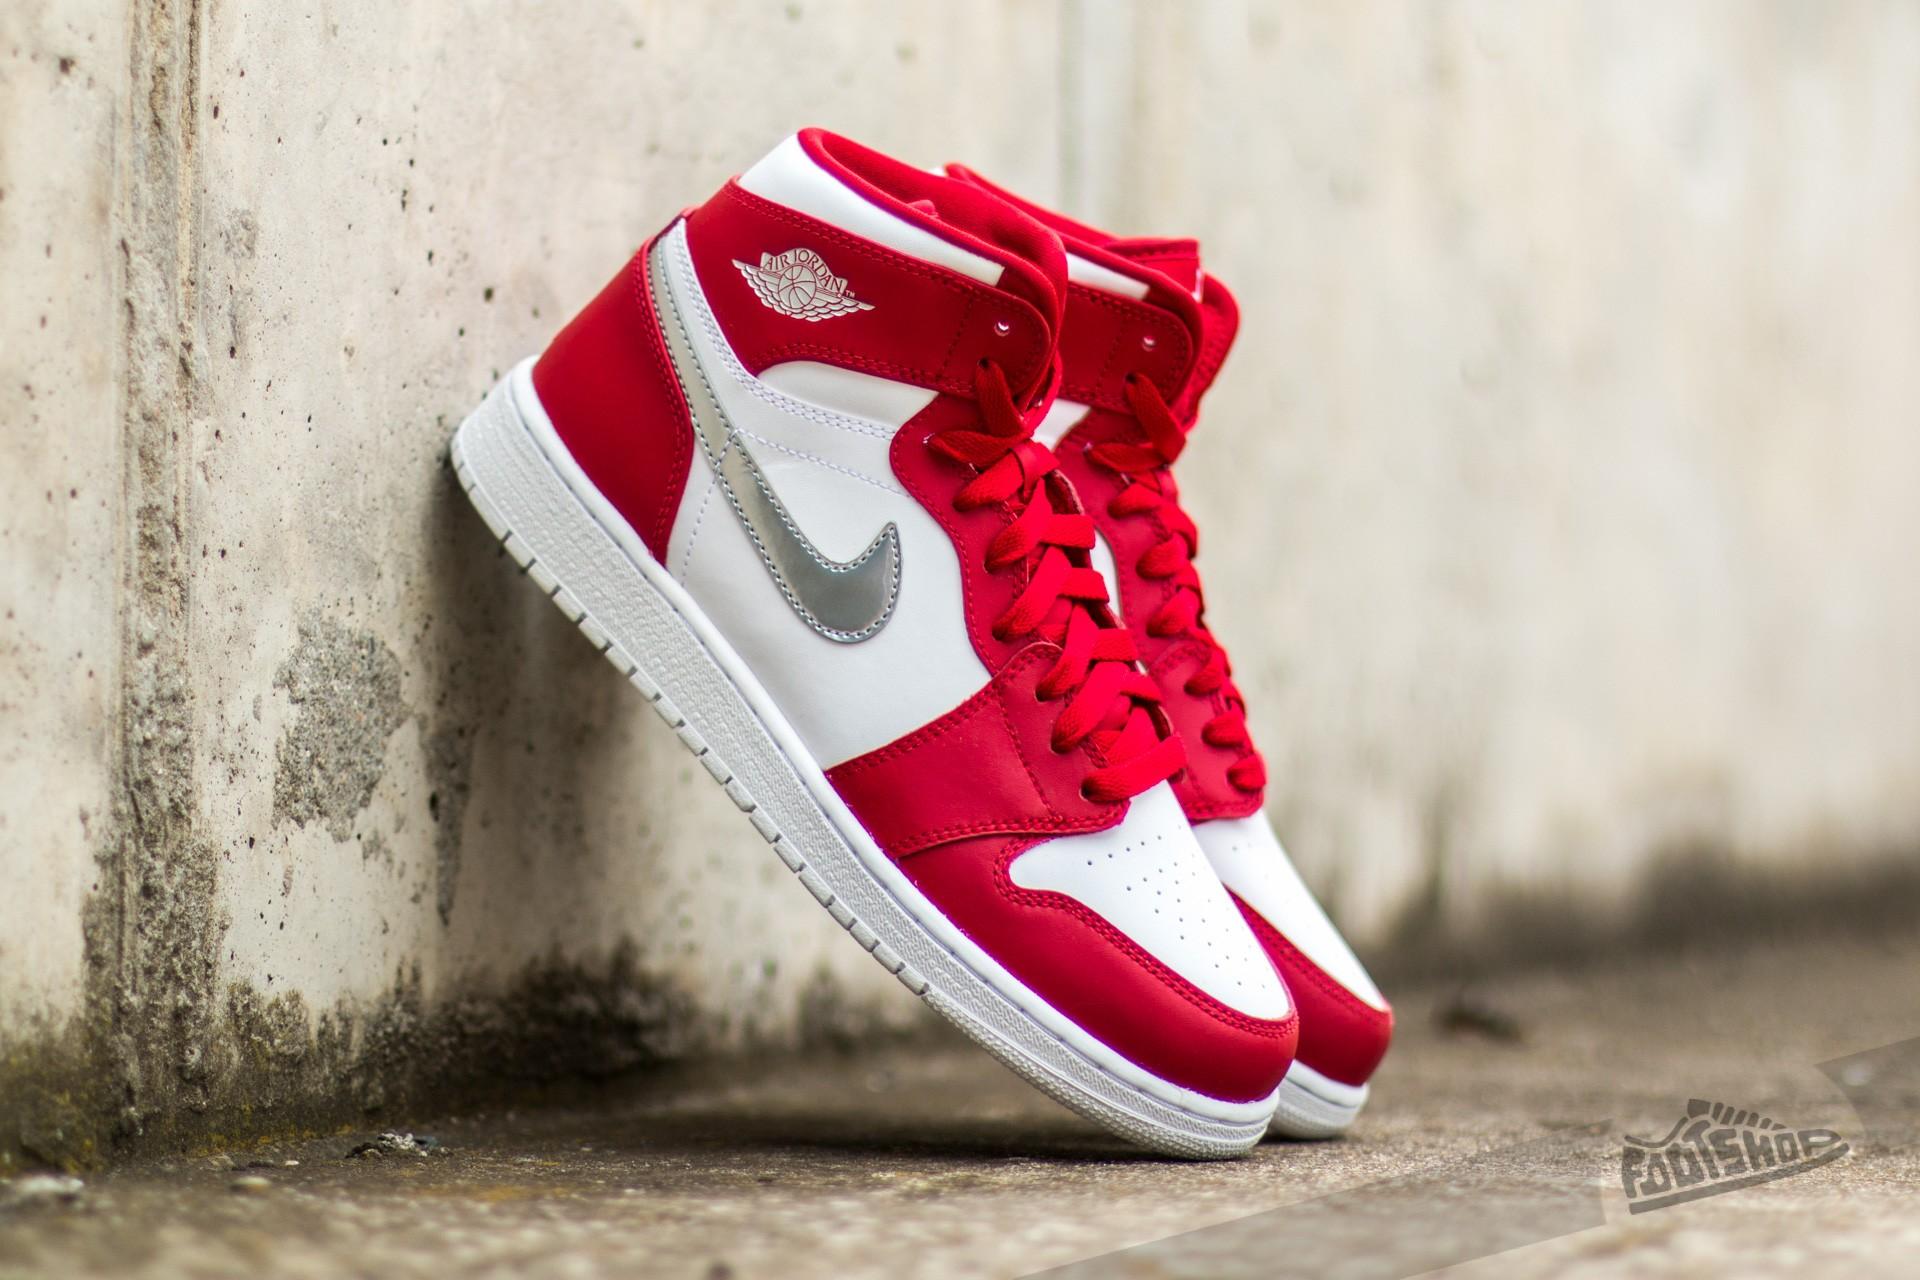 Air Jordan 1 Retro High (BG) Gym Red Metallic Silver White | Footshop